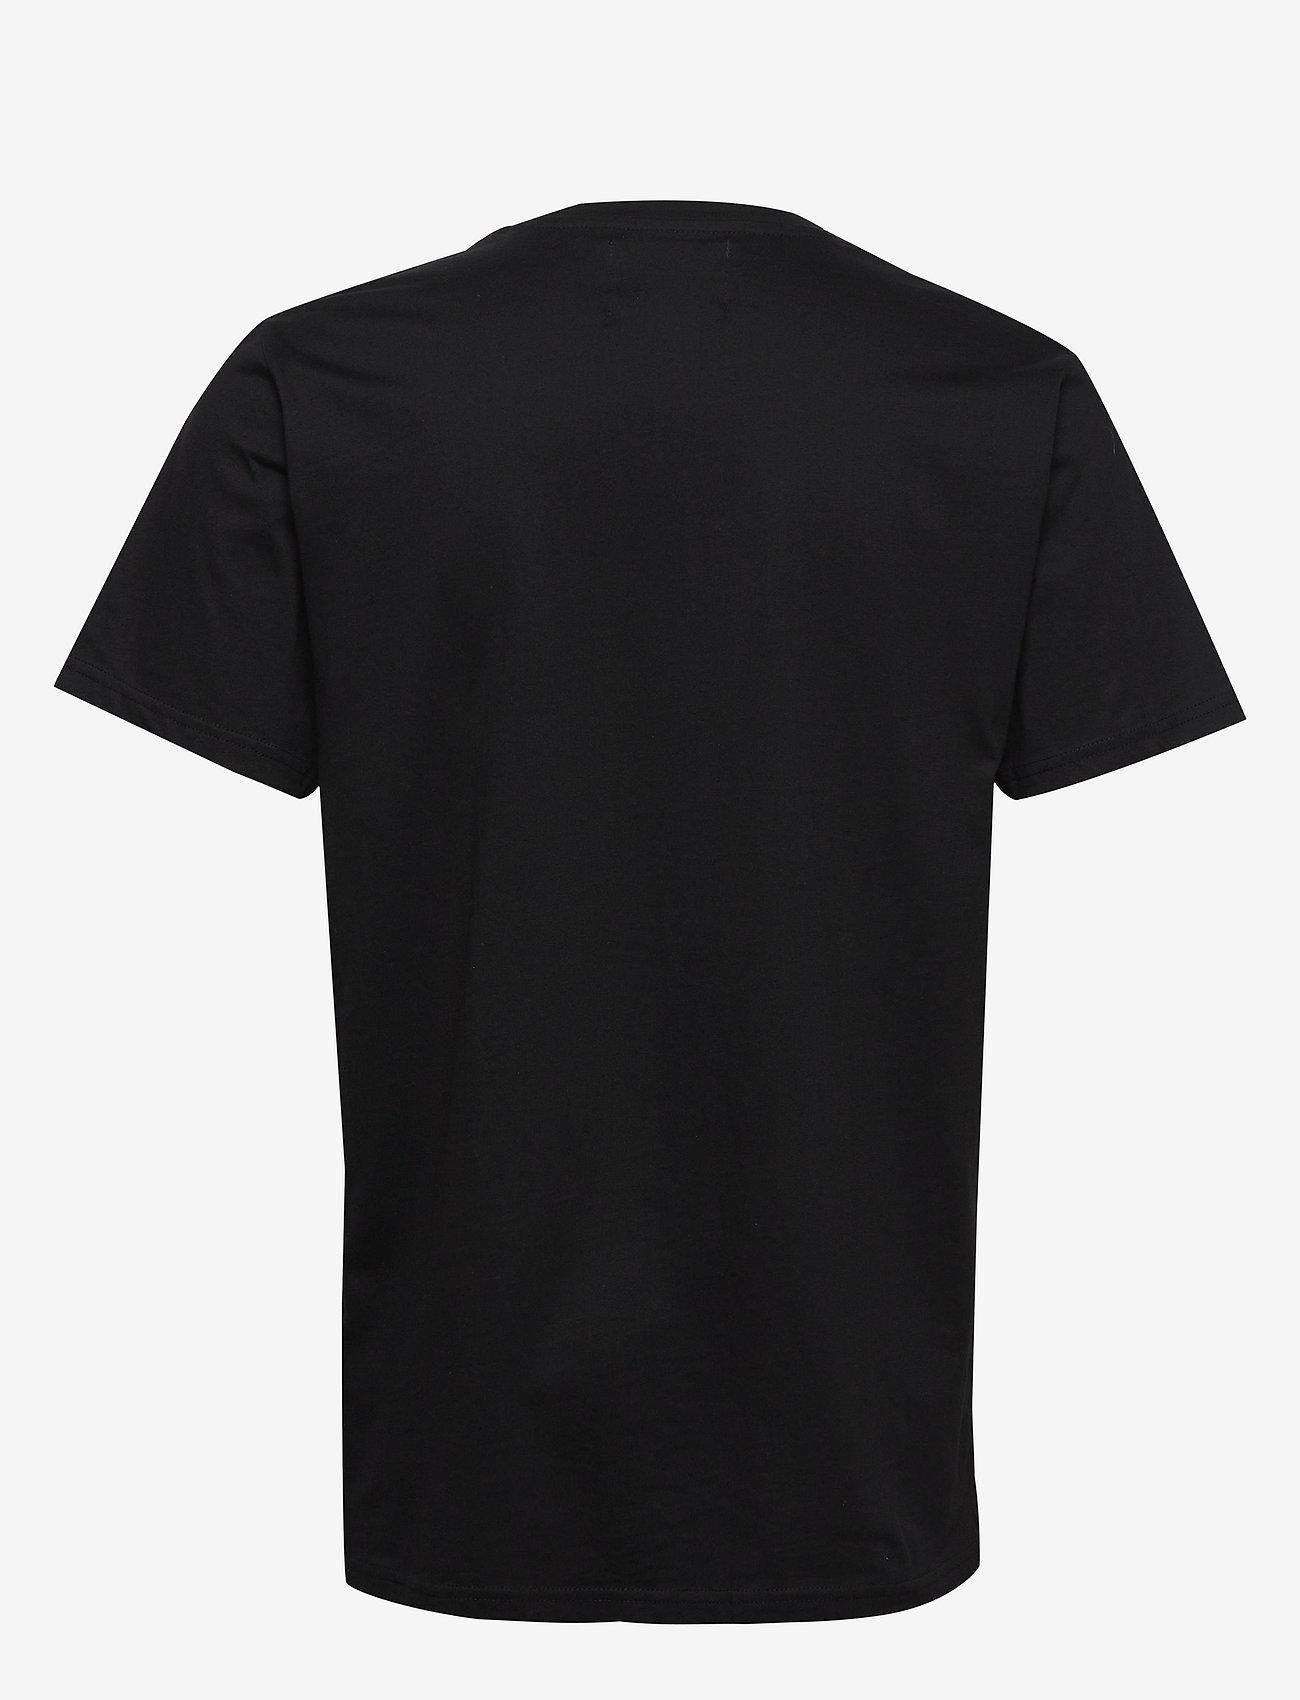 Denim Project Front S Logo Tee - T-shirts Black